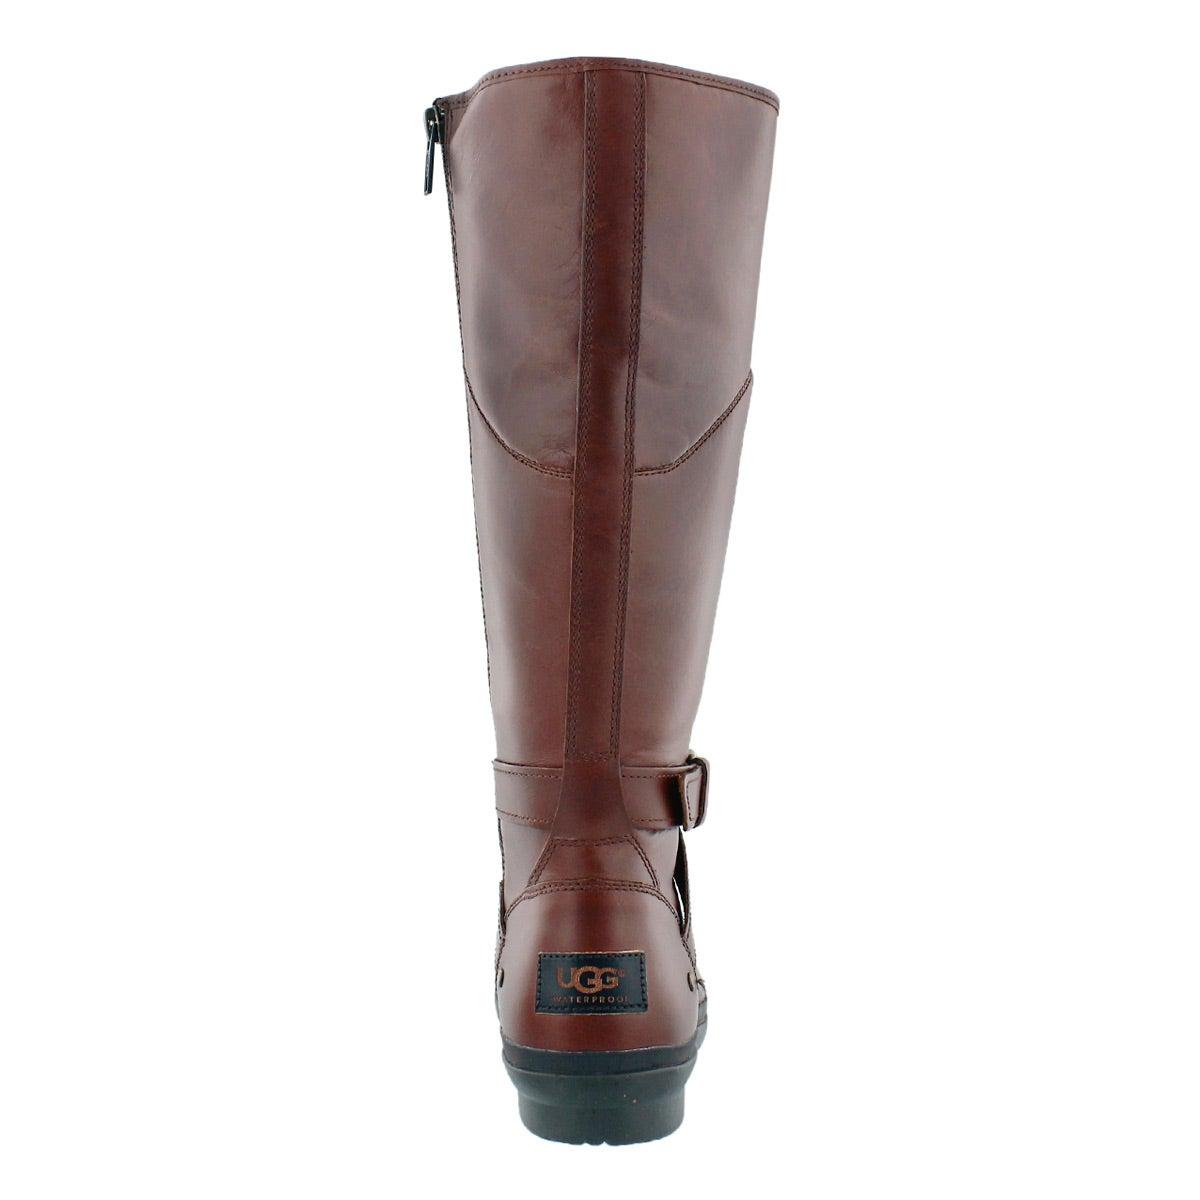 Lds Evanna stout waterproof riding boot